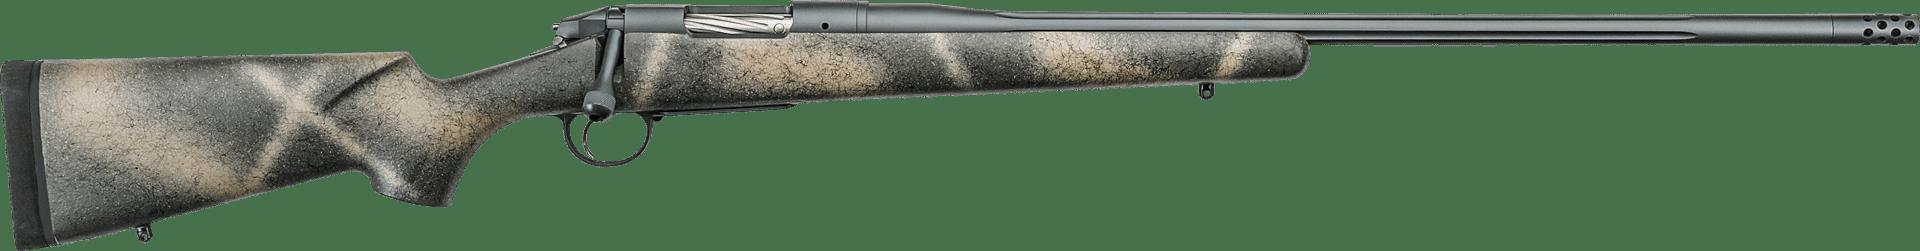 BPR31 Premier Highlander 2020 1920